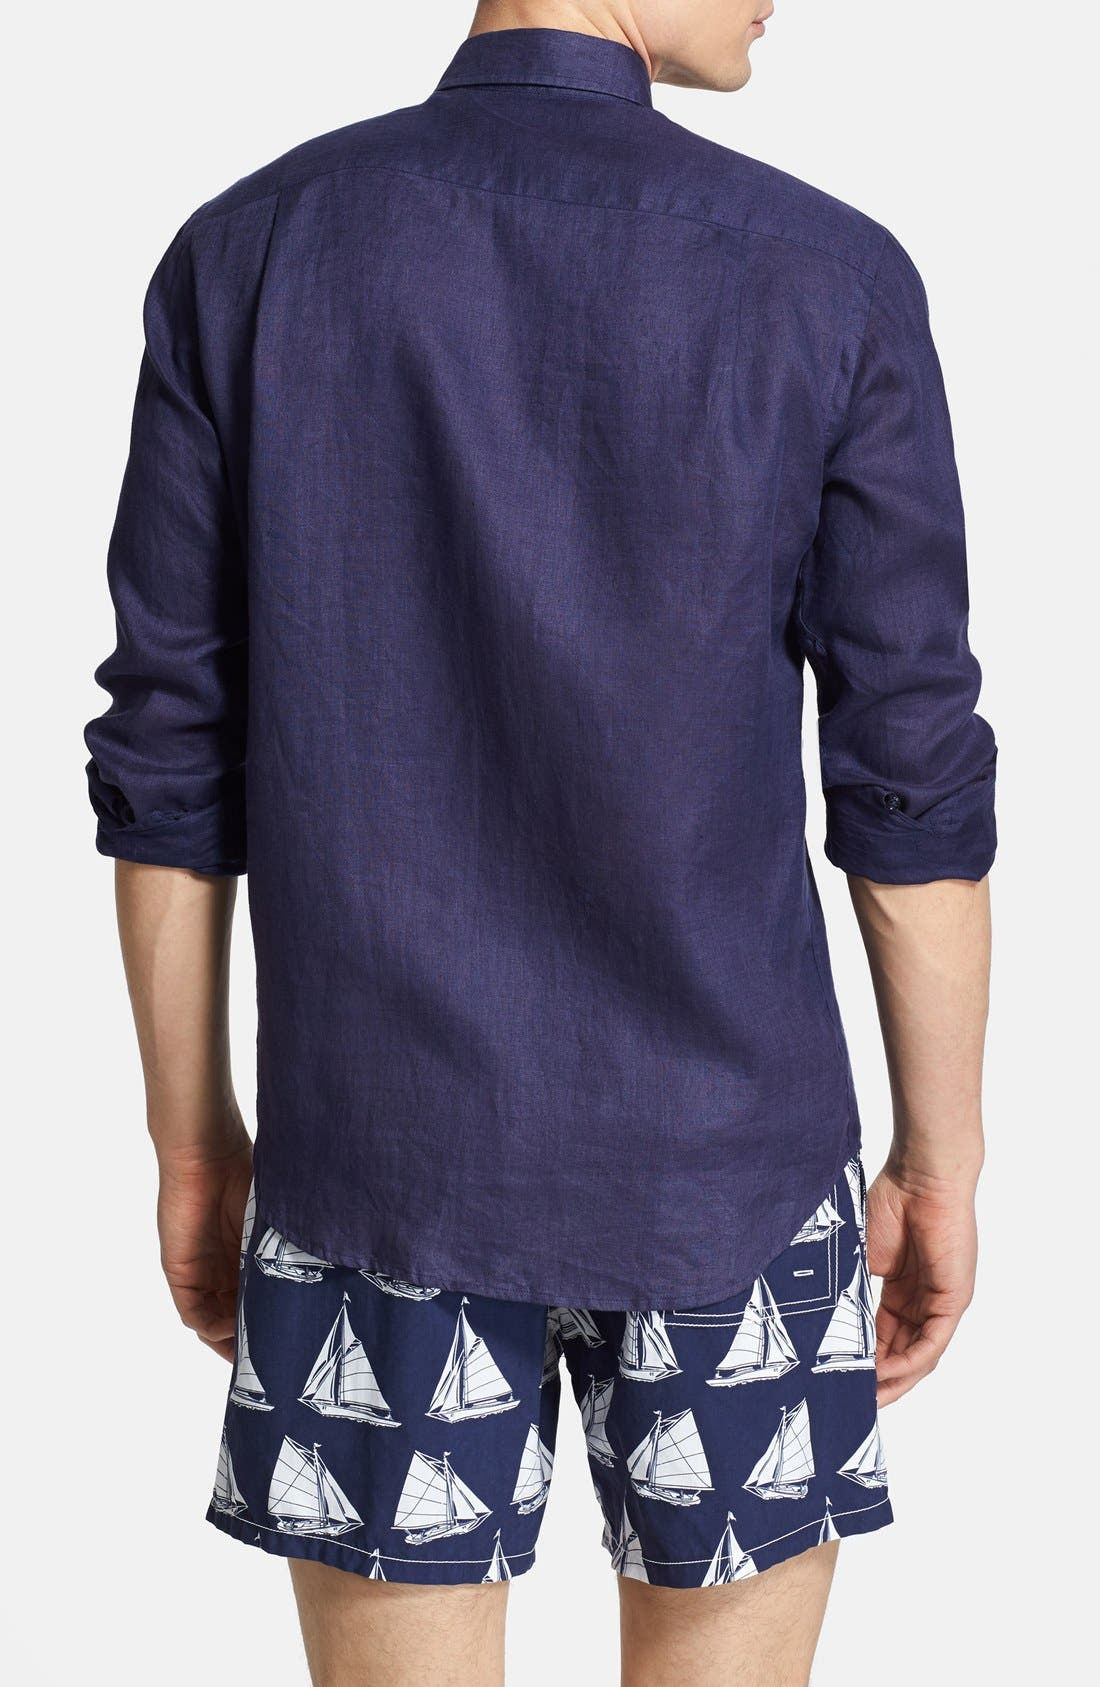 'Caroubier' Linen Shirt,                             Alternate thumbnail 46, color,